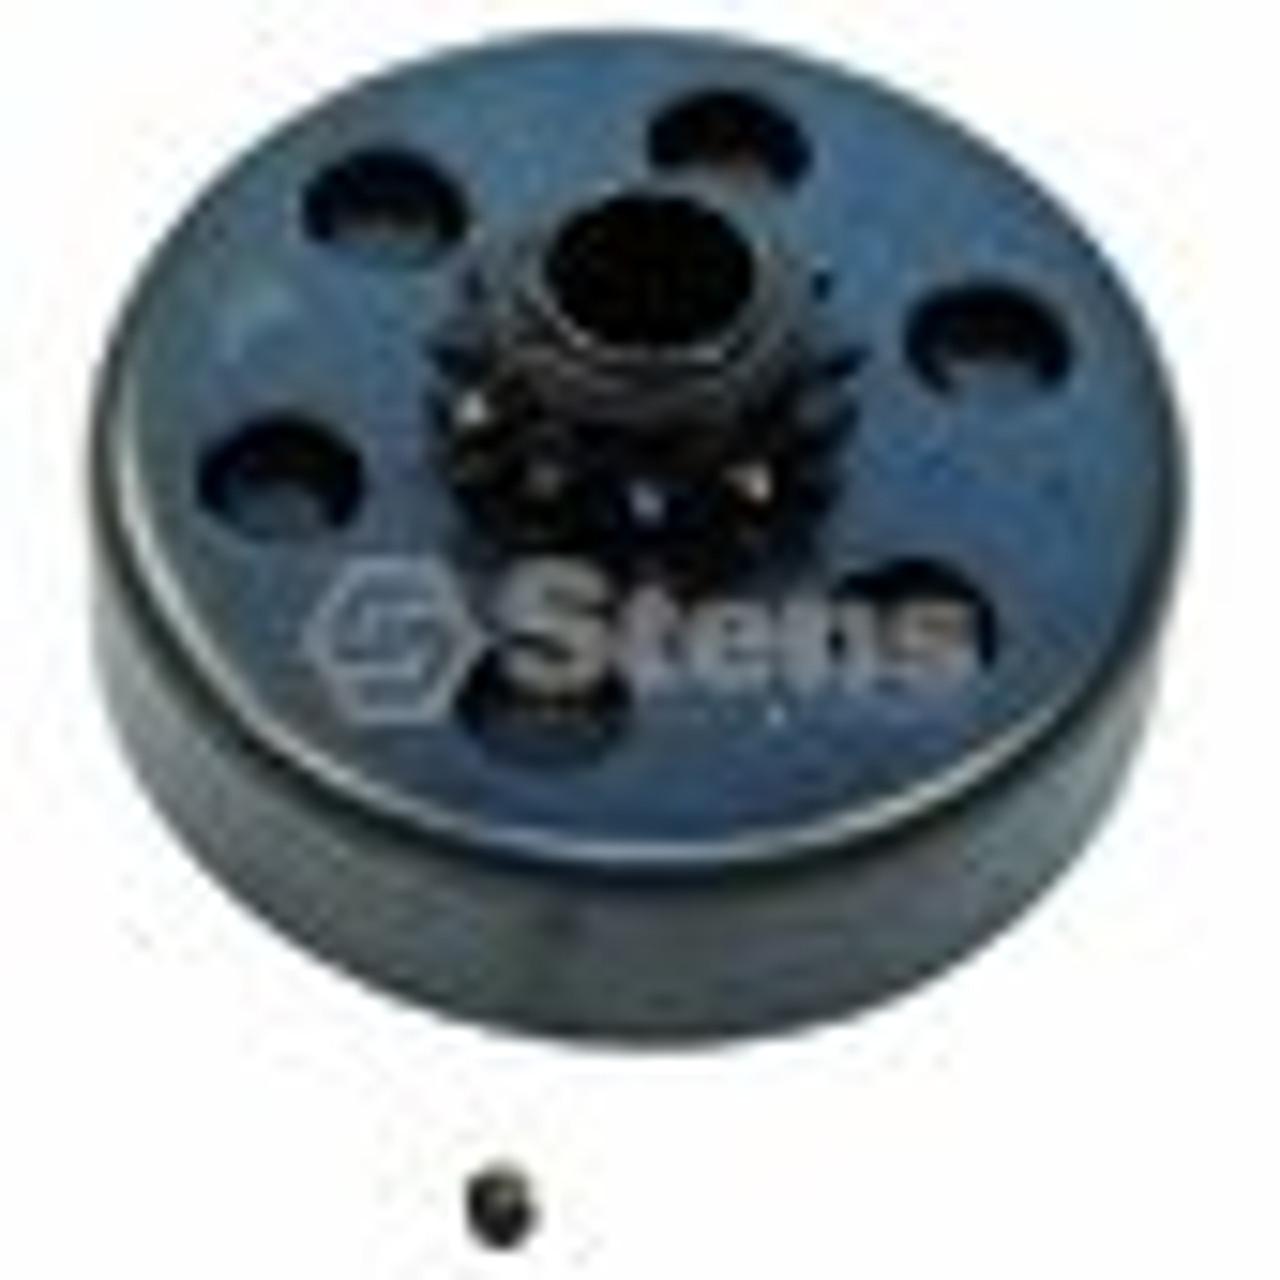 Stens 285-275 Key Switch Cap